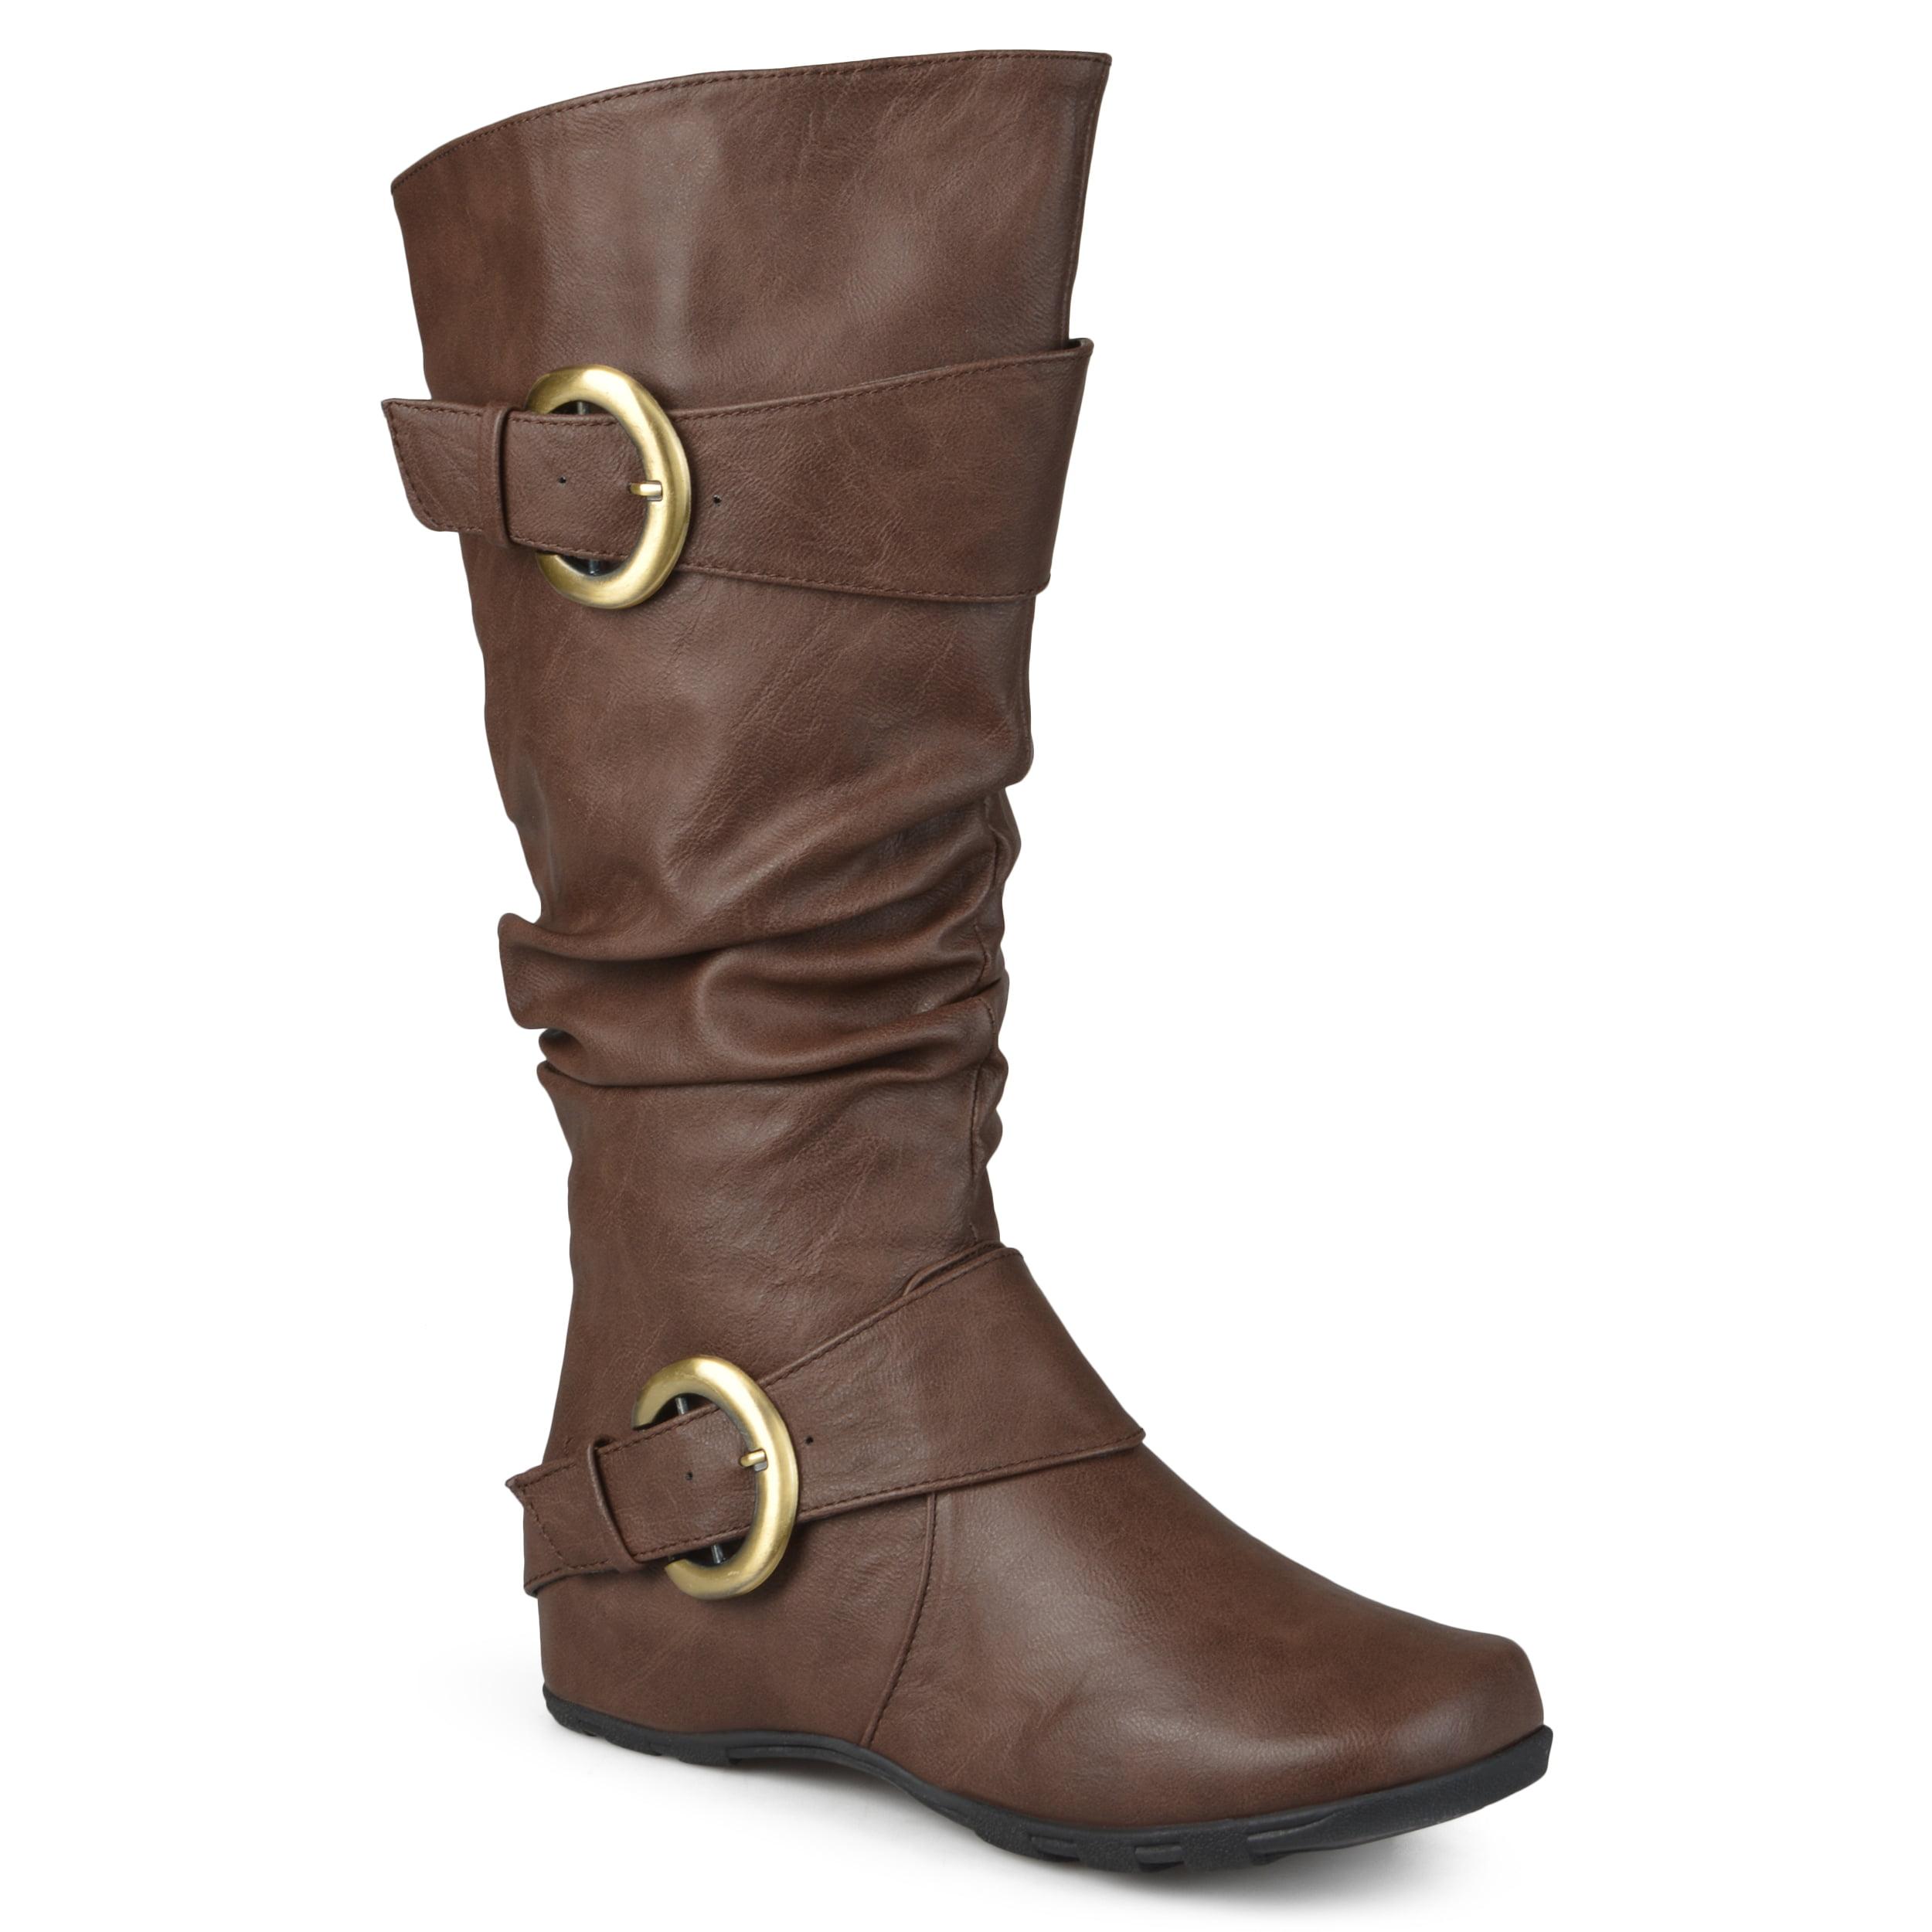 Womens Wide-calf Boots - Walmart.com